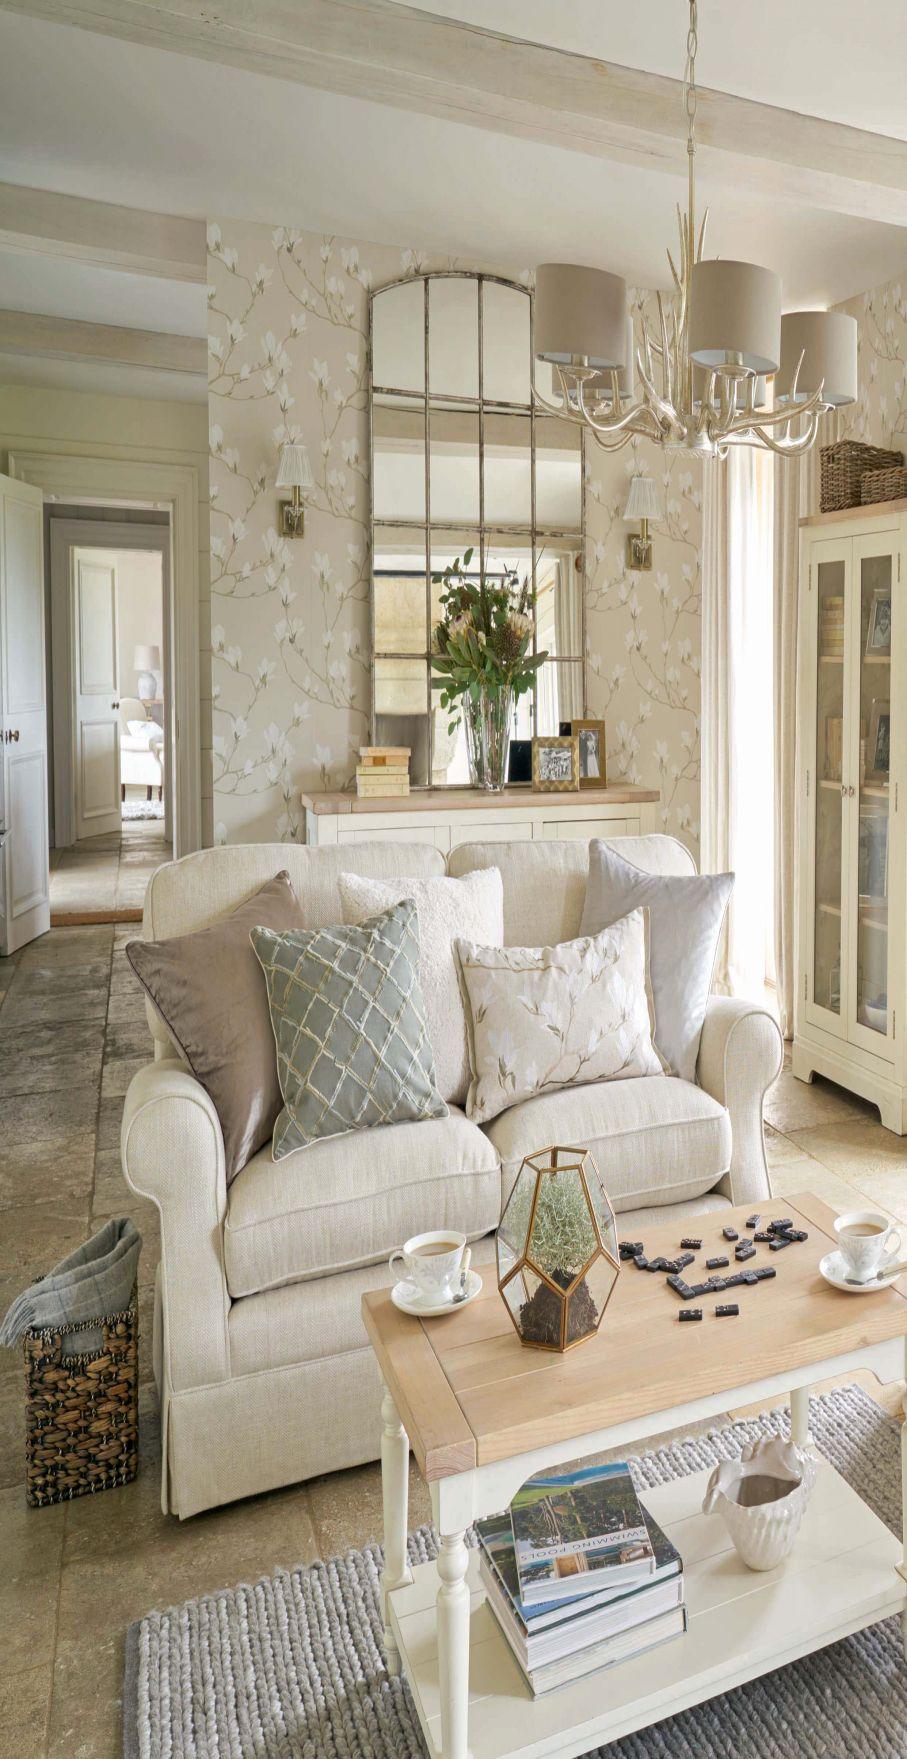 49 elegant apartment living room decor ideas on a budget